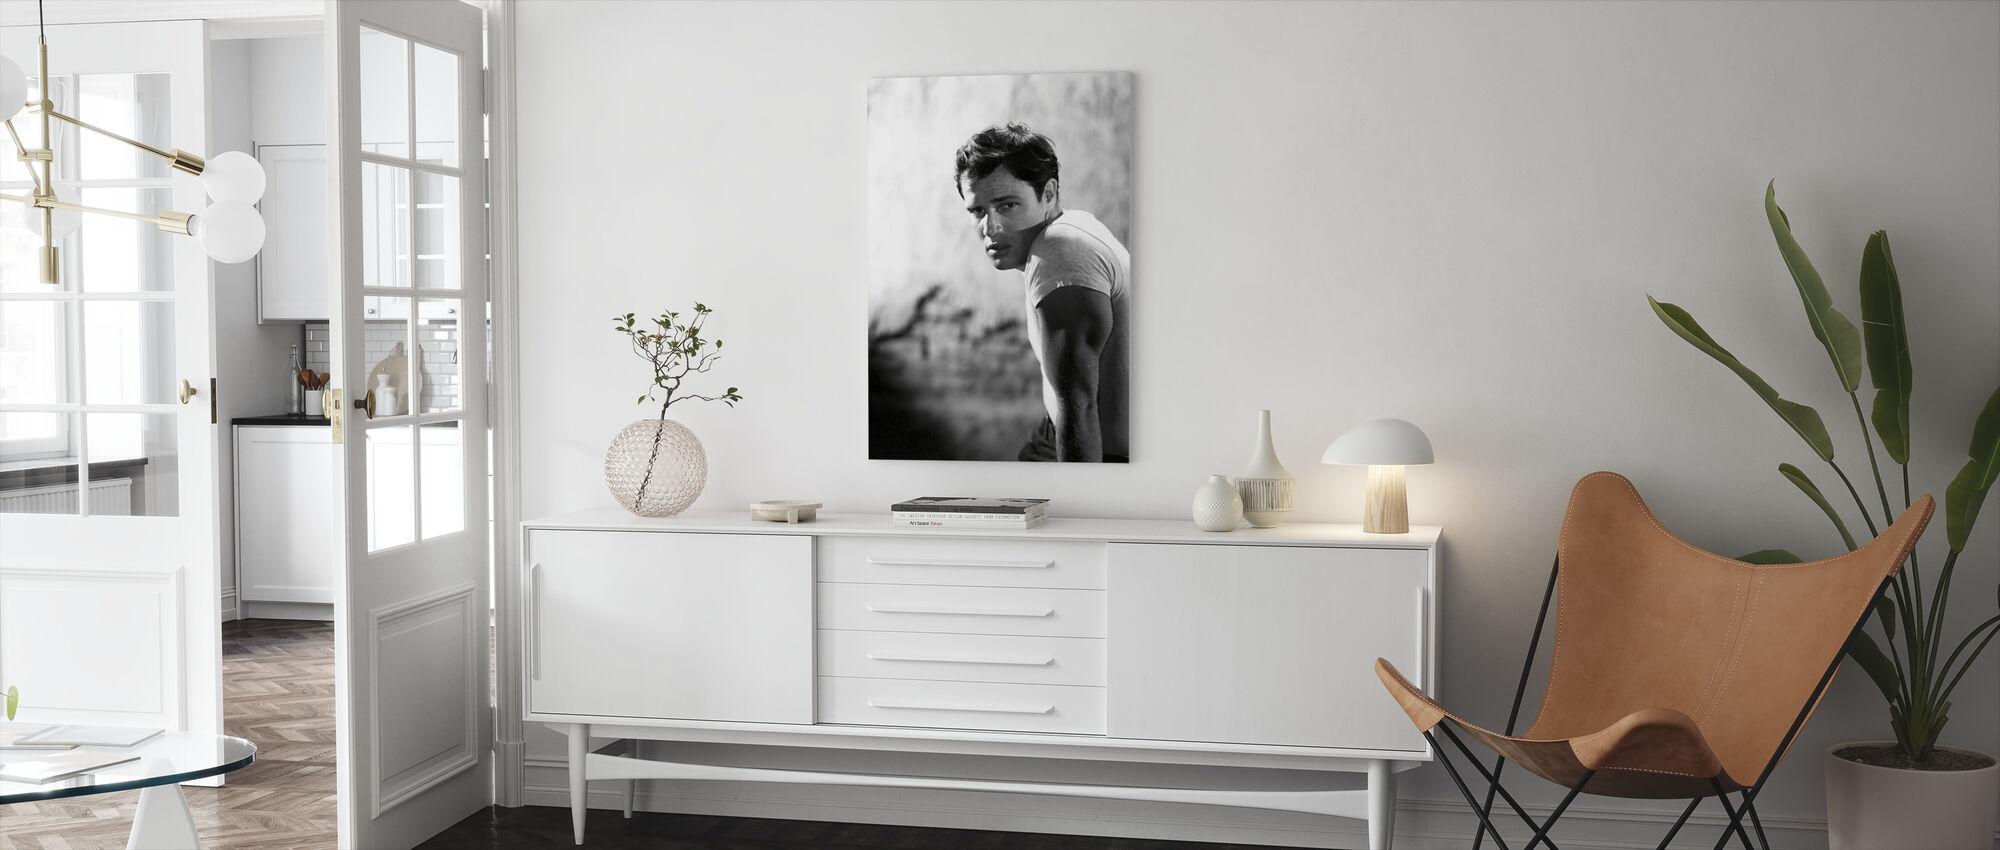 Marlon Brando in a Streetcar Named Desire - Canvas print - Living Room